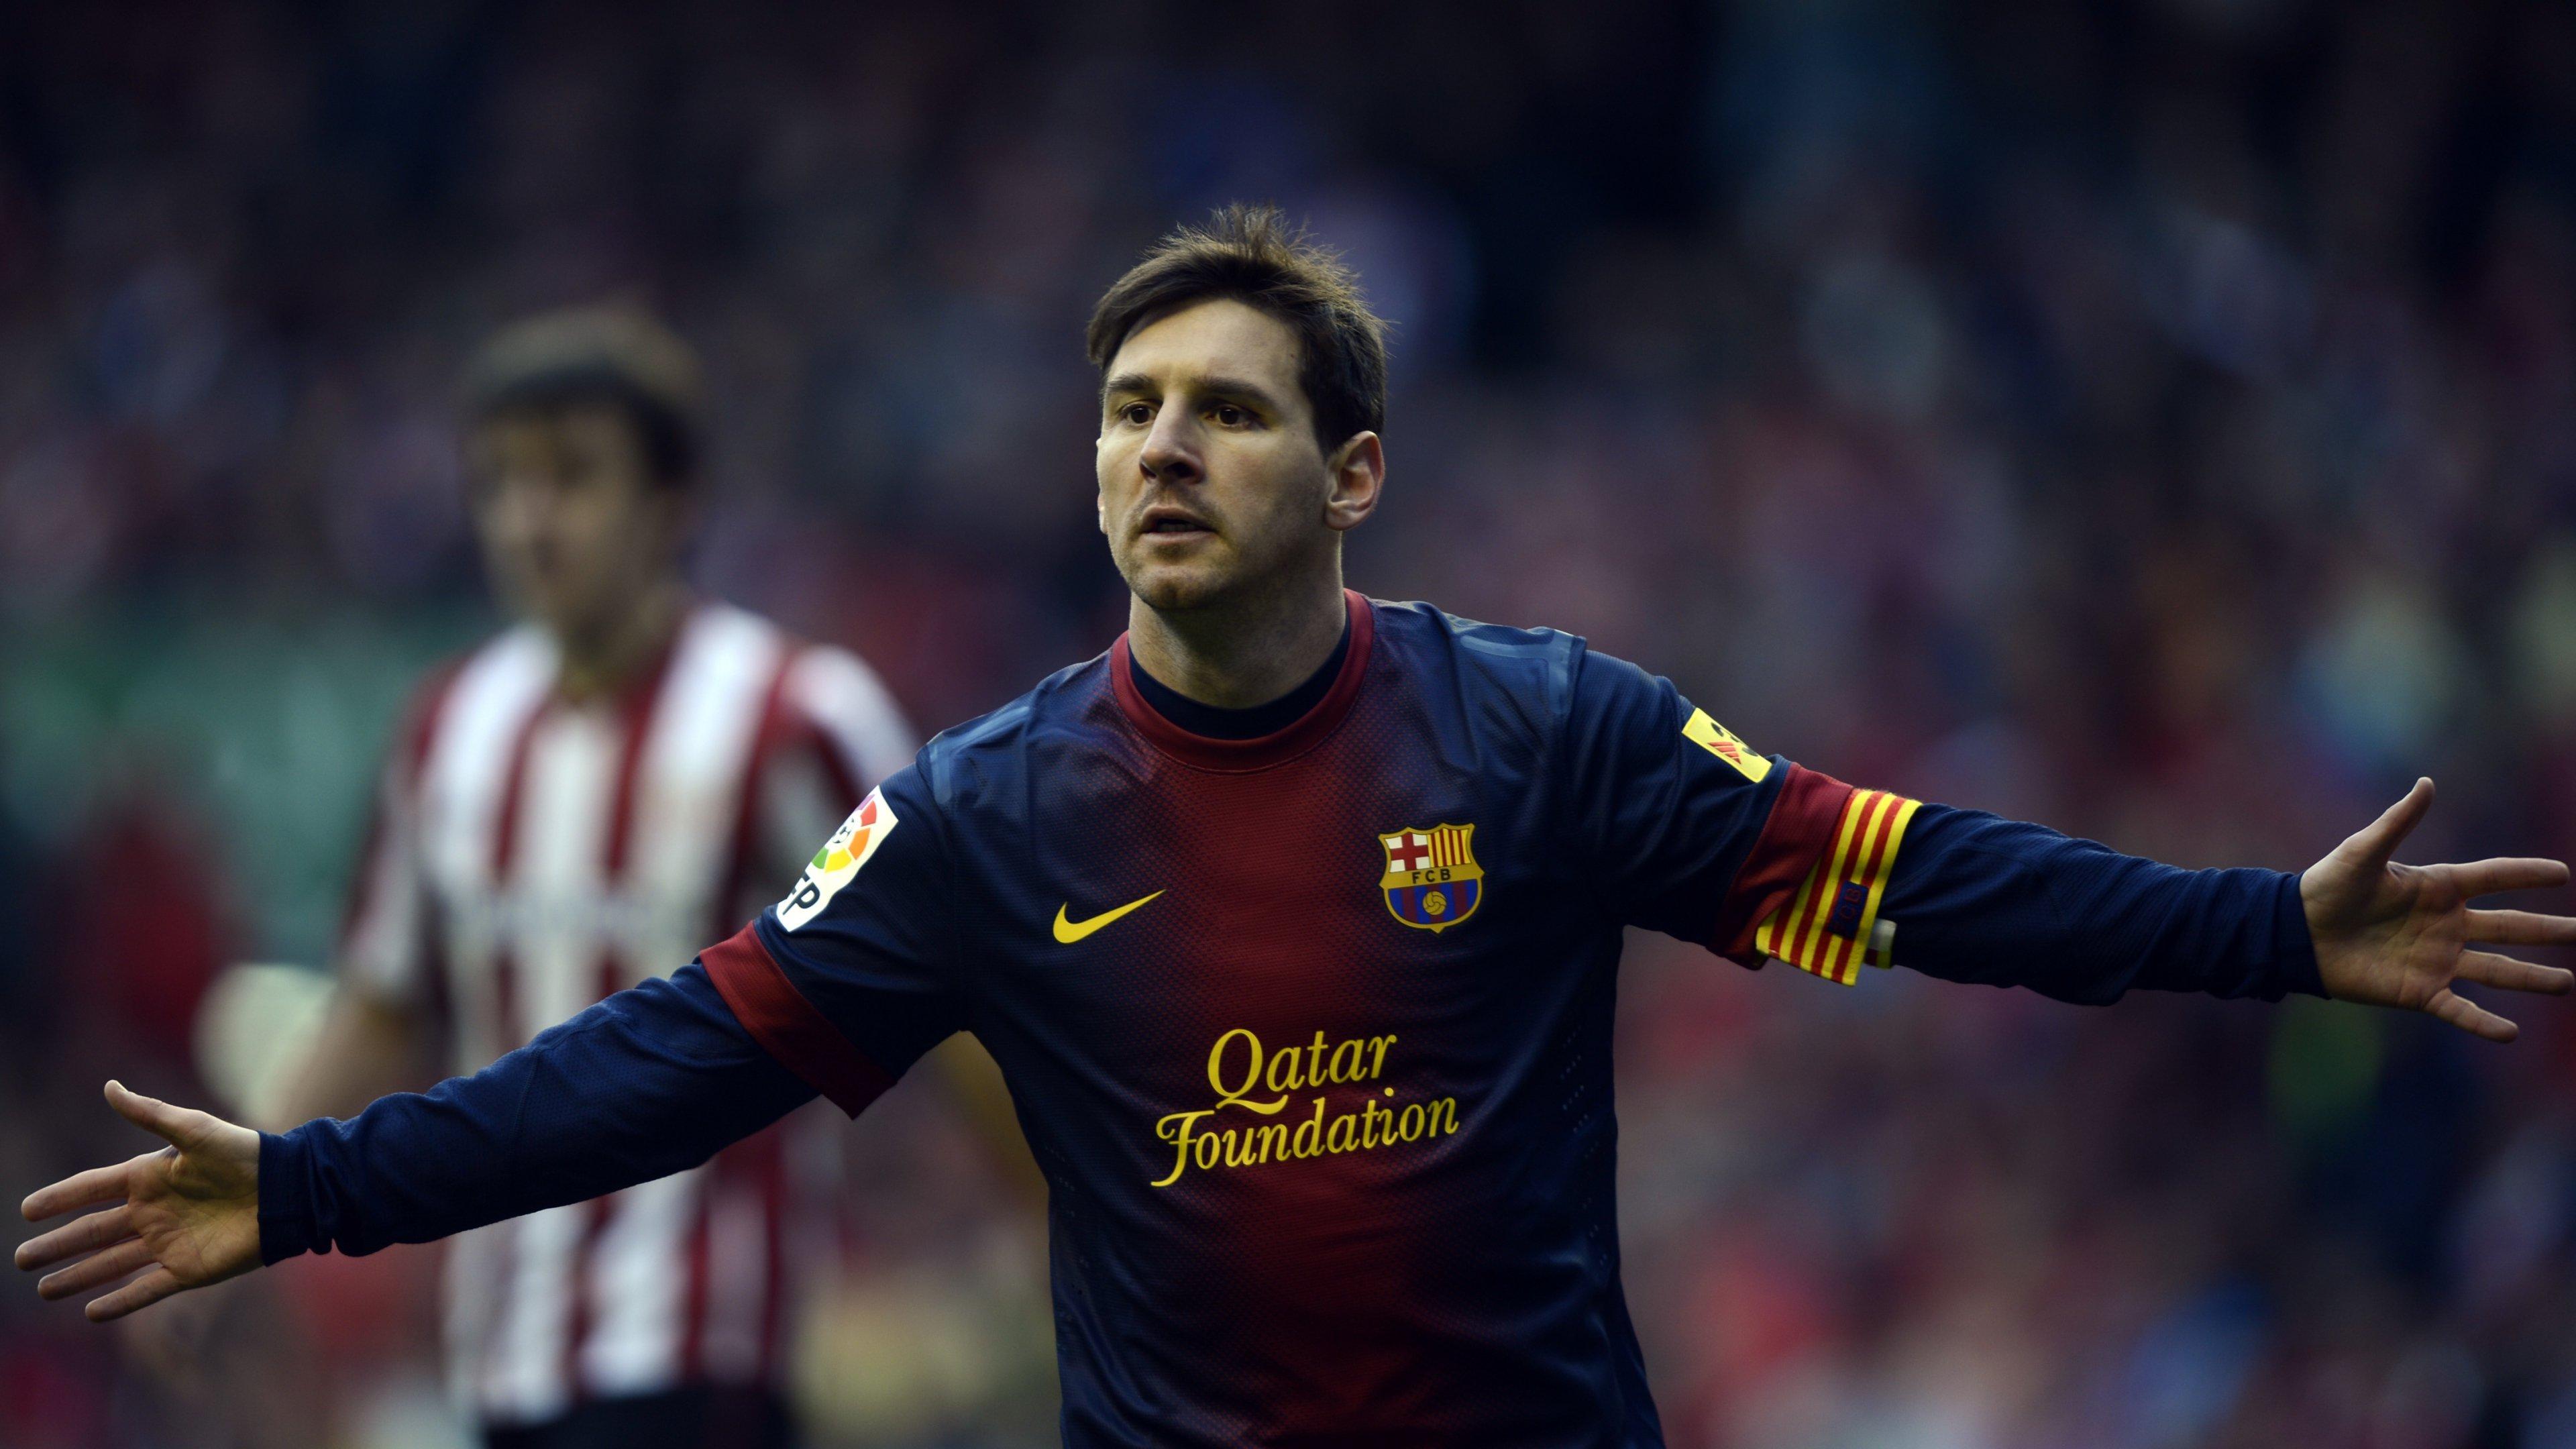 Lionel Messi Wallpapers 3840x2160 Ultra Hd 4k Desktop Backgrounds